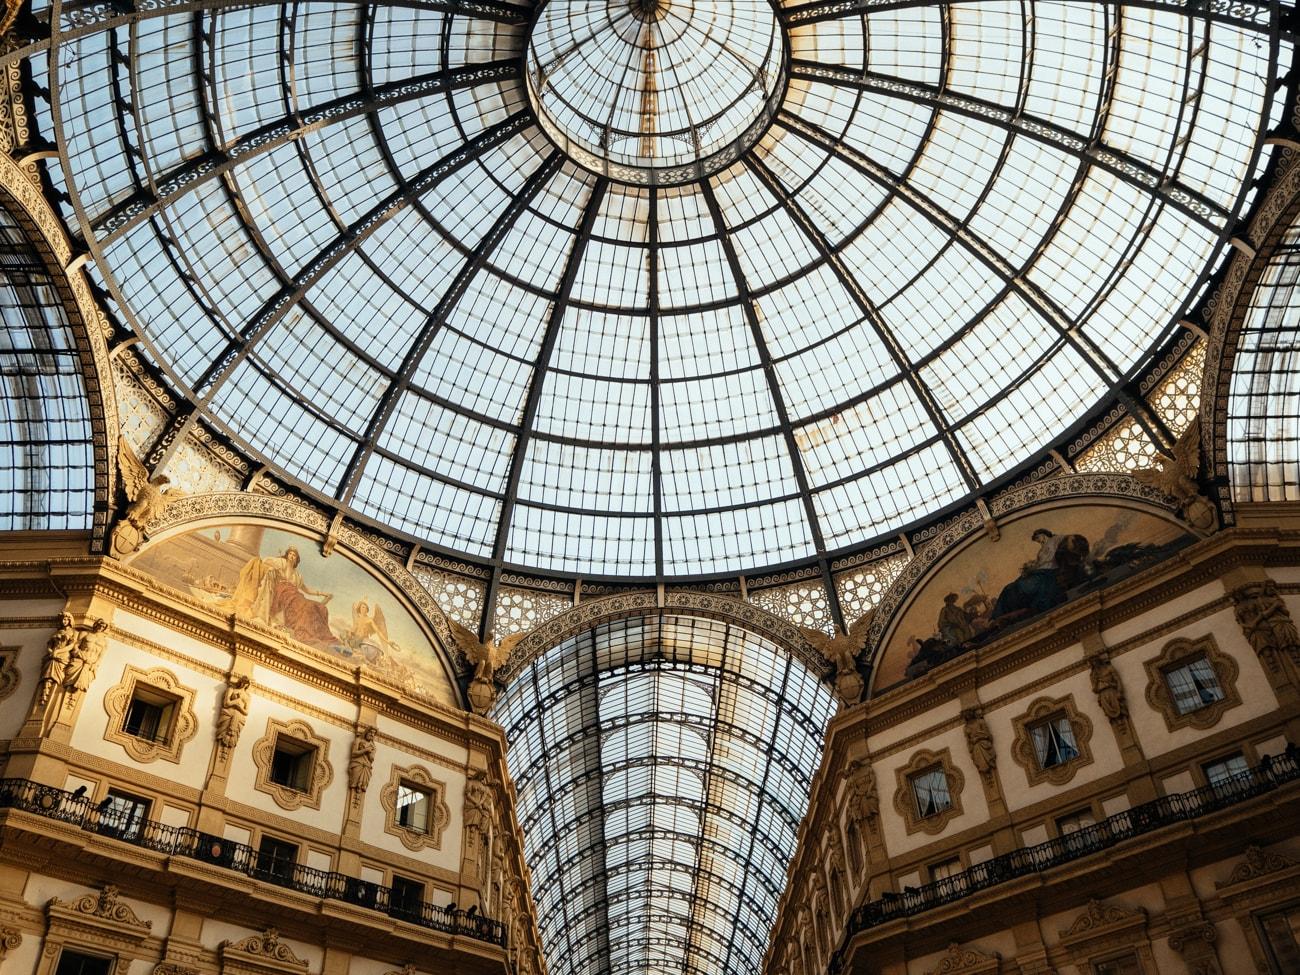 Galleria Vittorio Emanuele in Milan, Italty | Monika Prokůpková / © Culture Trip